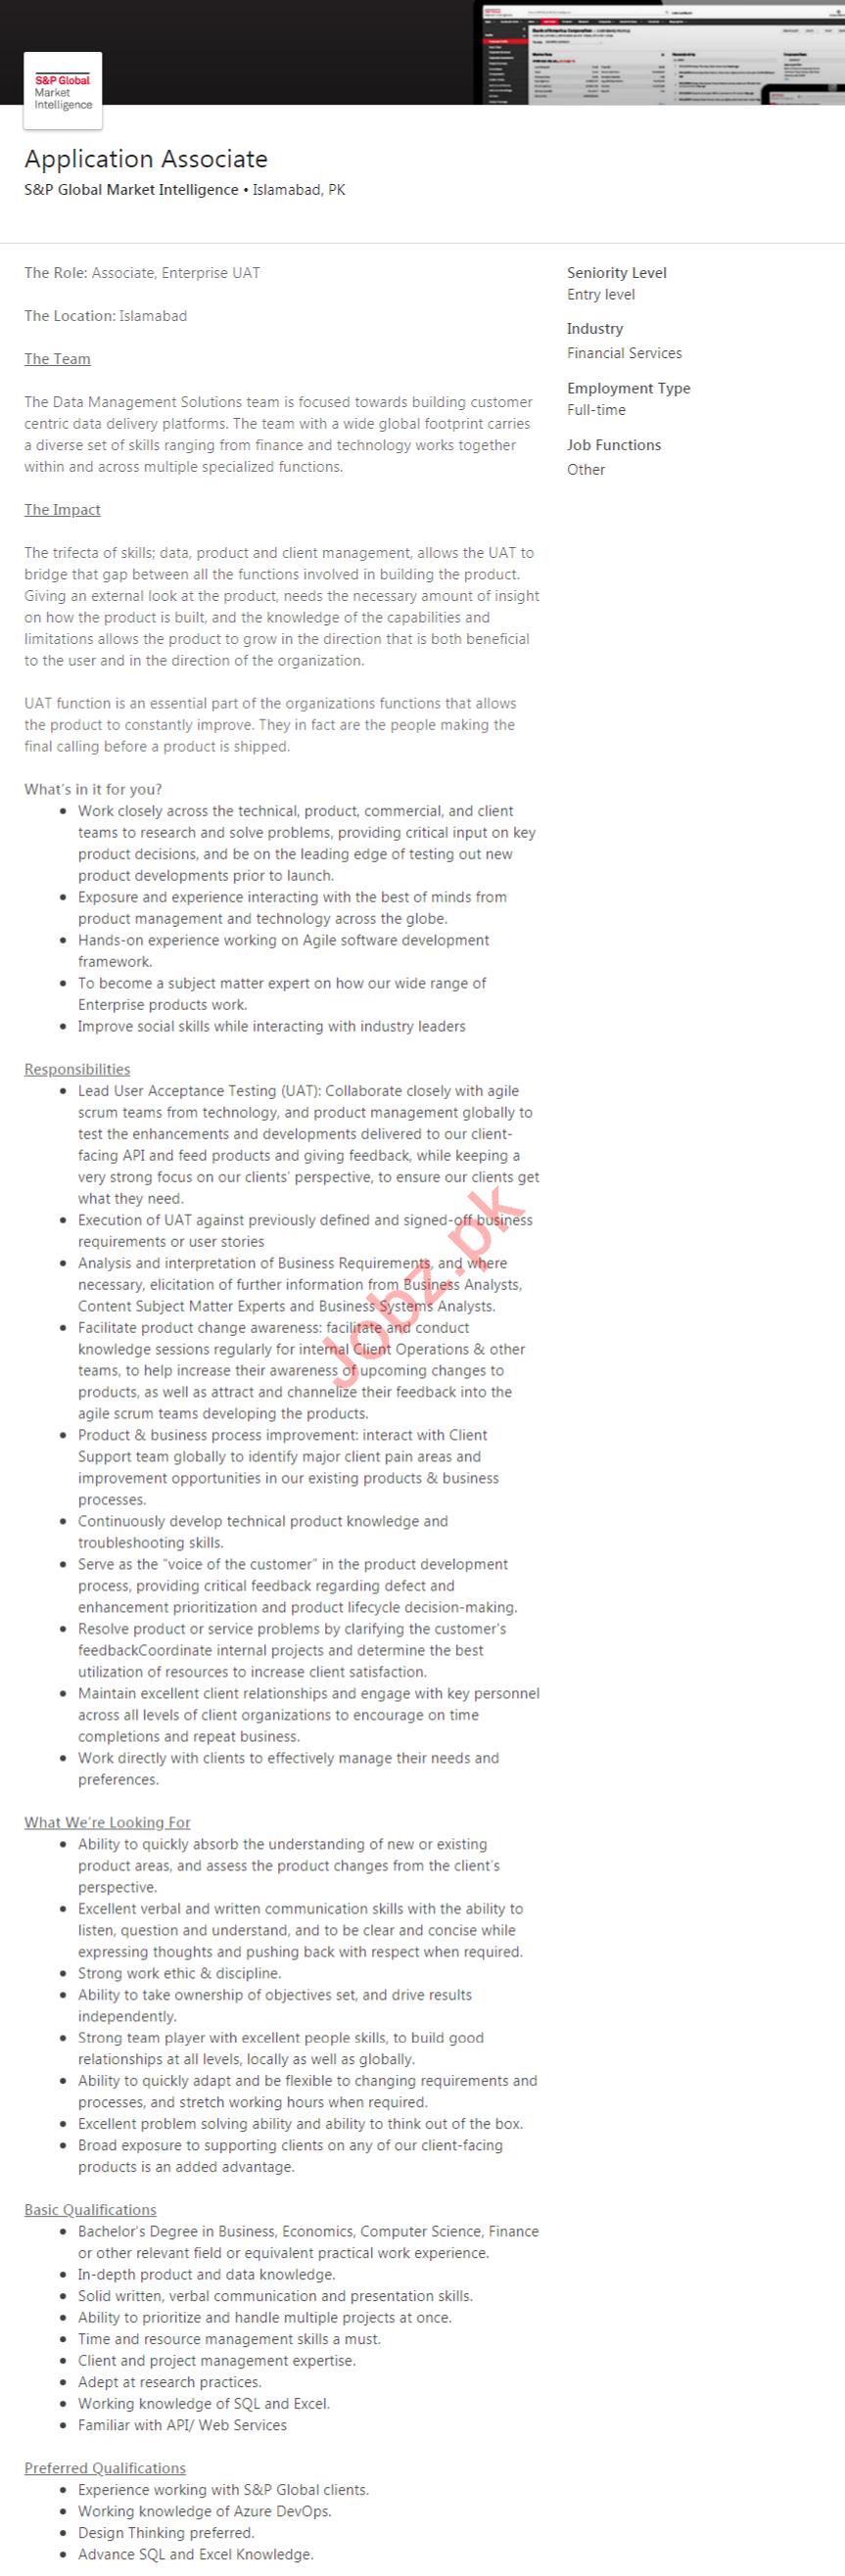 S&P Global Market Intelligence Islamabad Jobs 2020